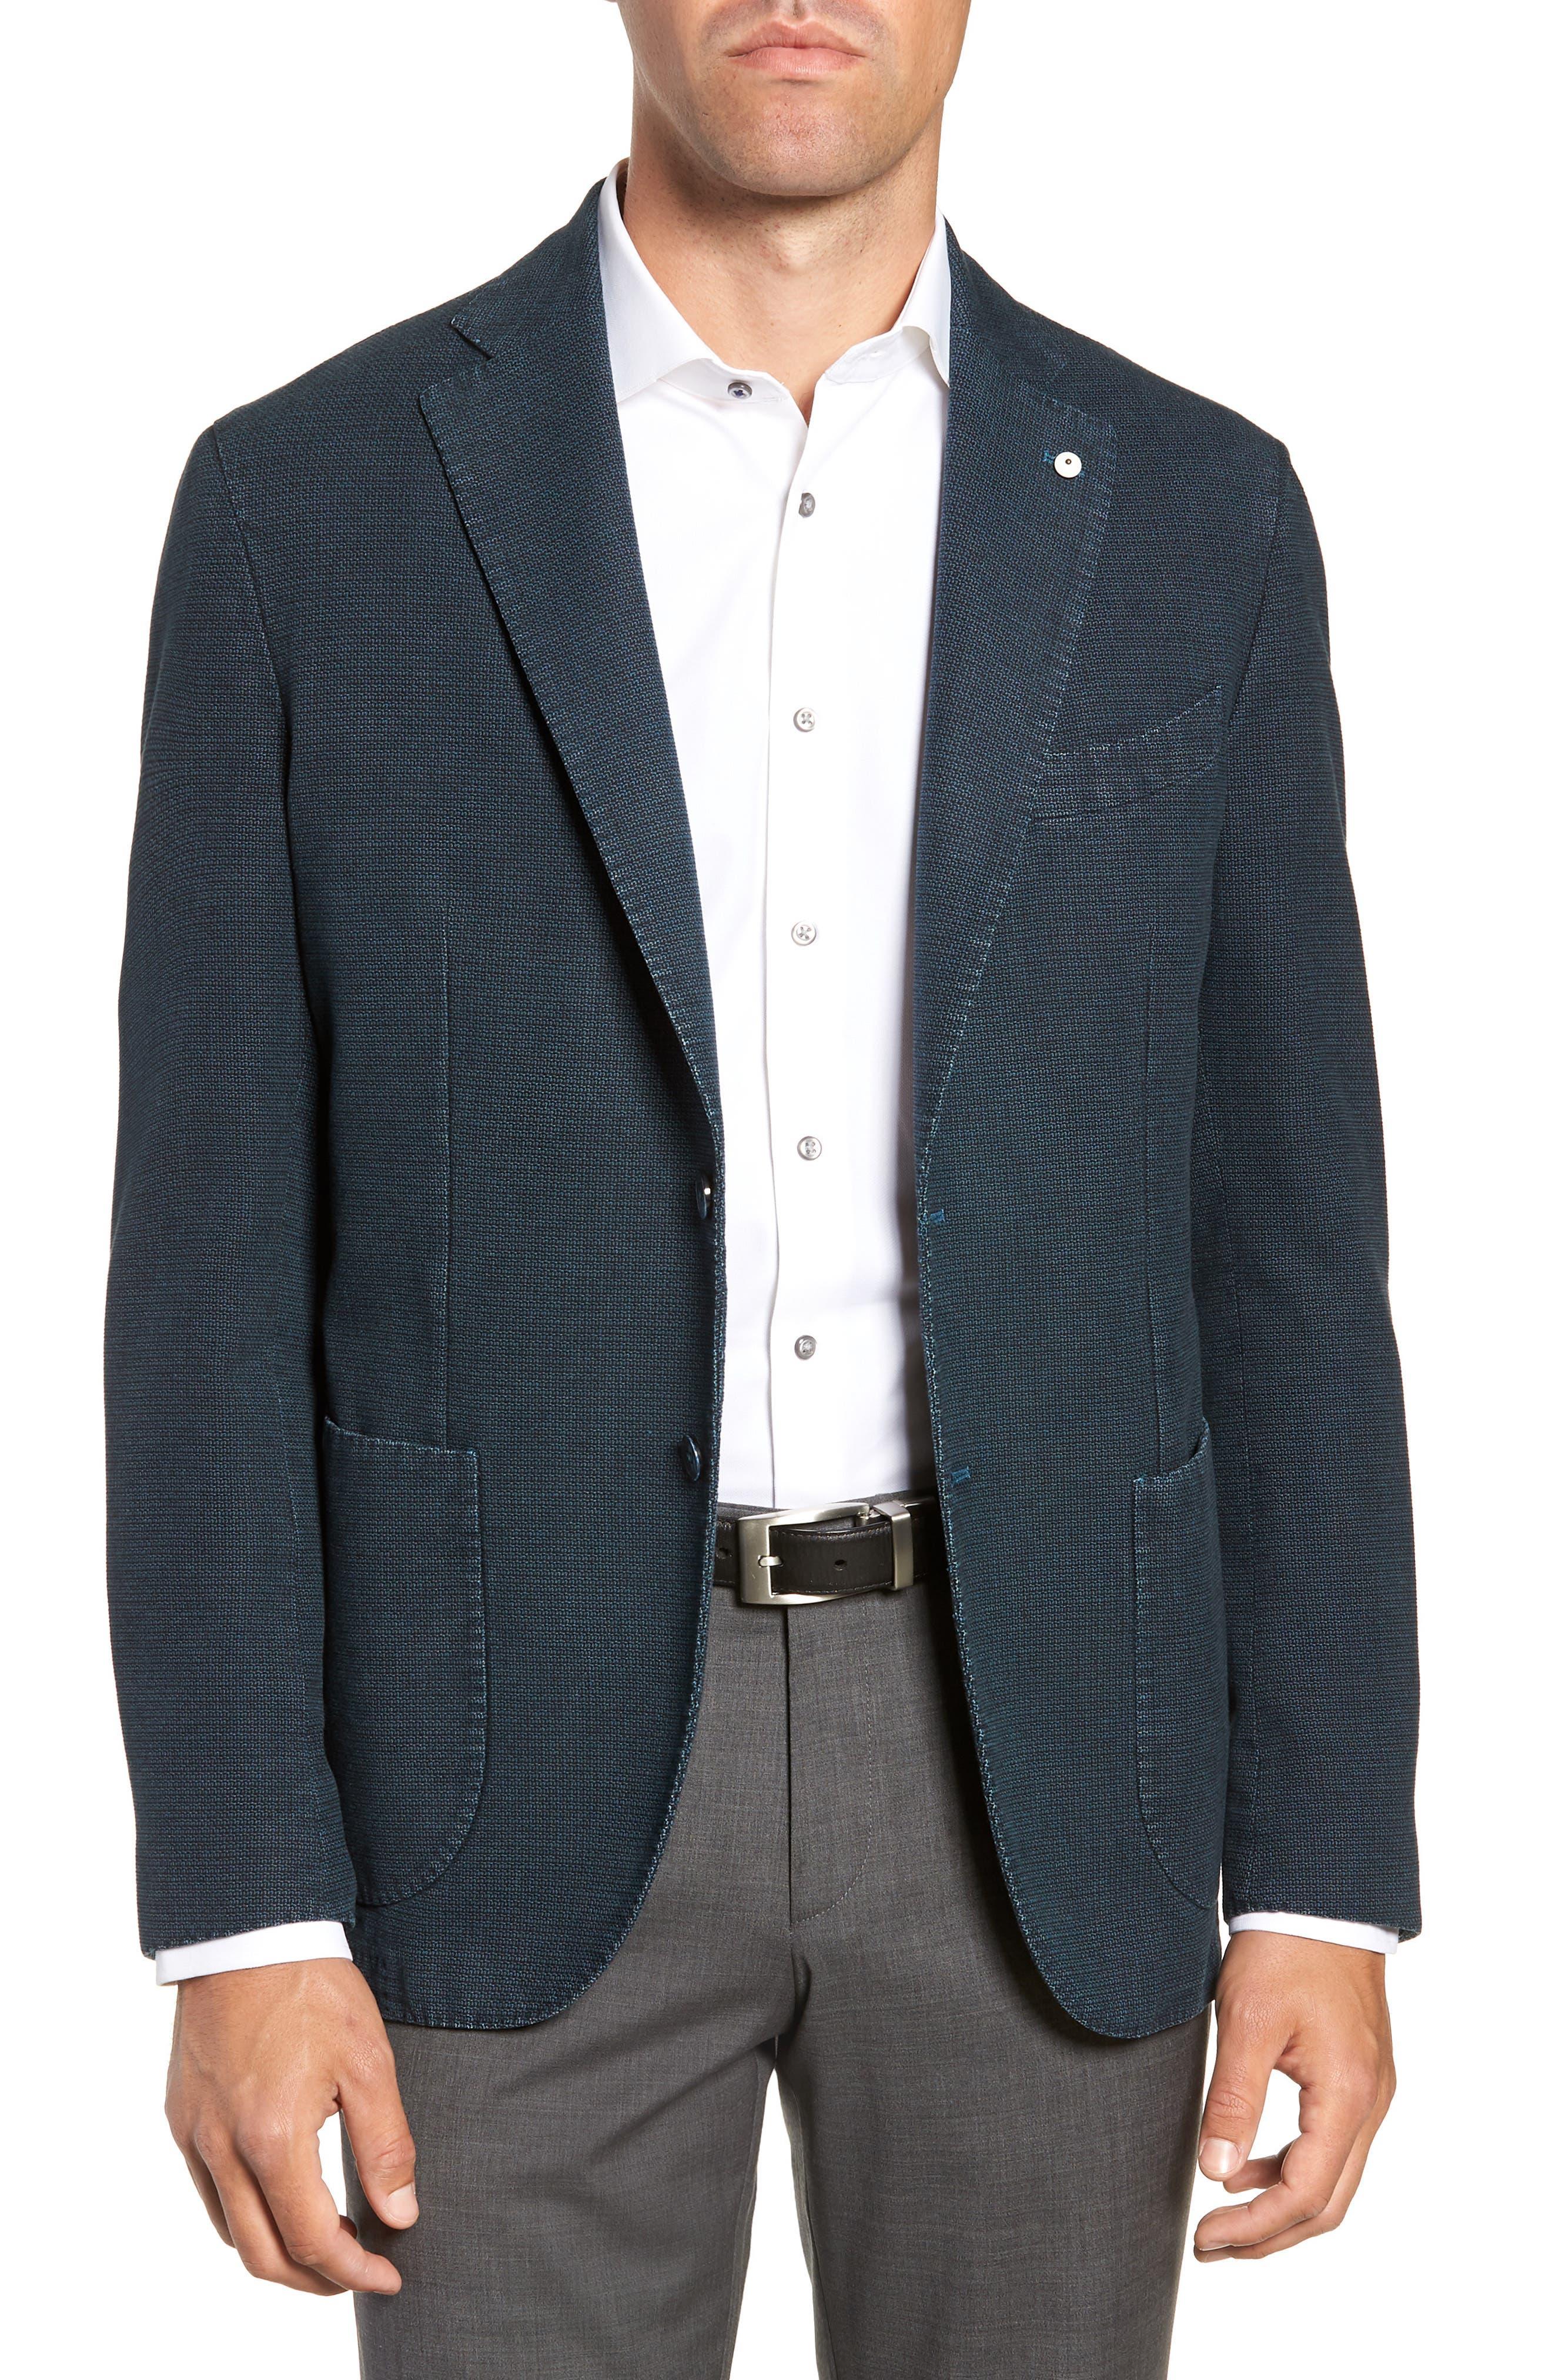 L.B.M L.B.M 1911 Classic Fit Cotton Sport Coat in Blue/ Green